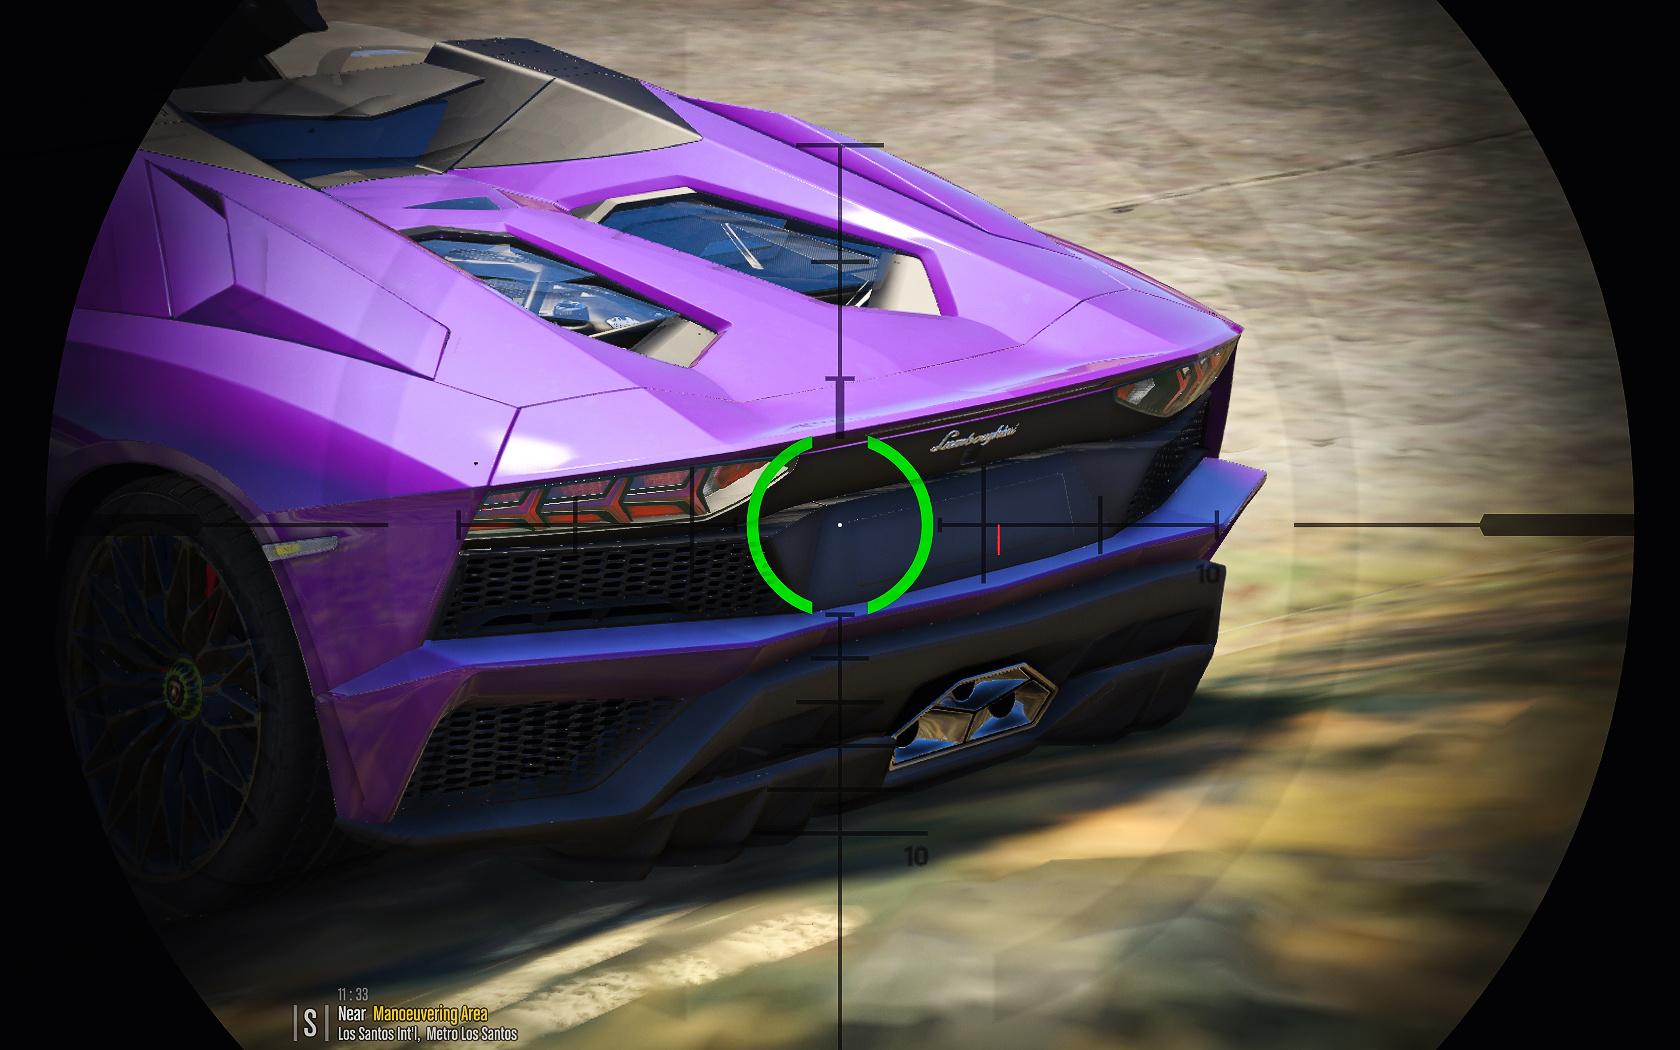 2018 Lamborghini Aventador S Roadster Interior Retexture Gta5 Mods Com